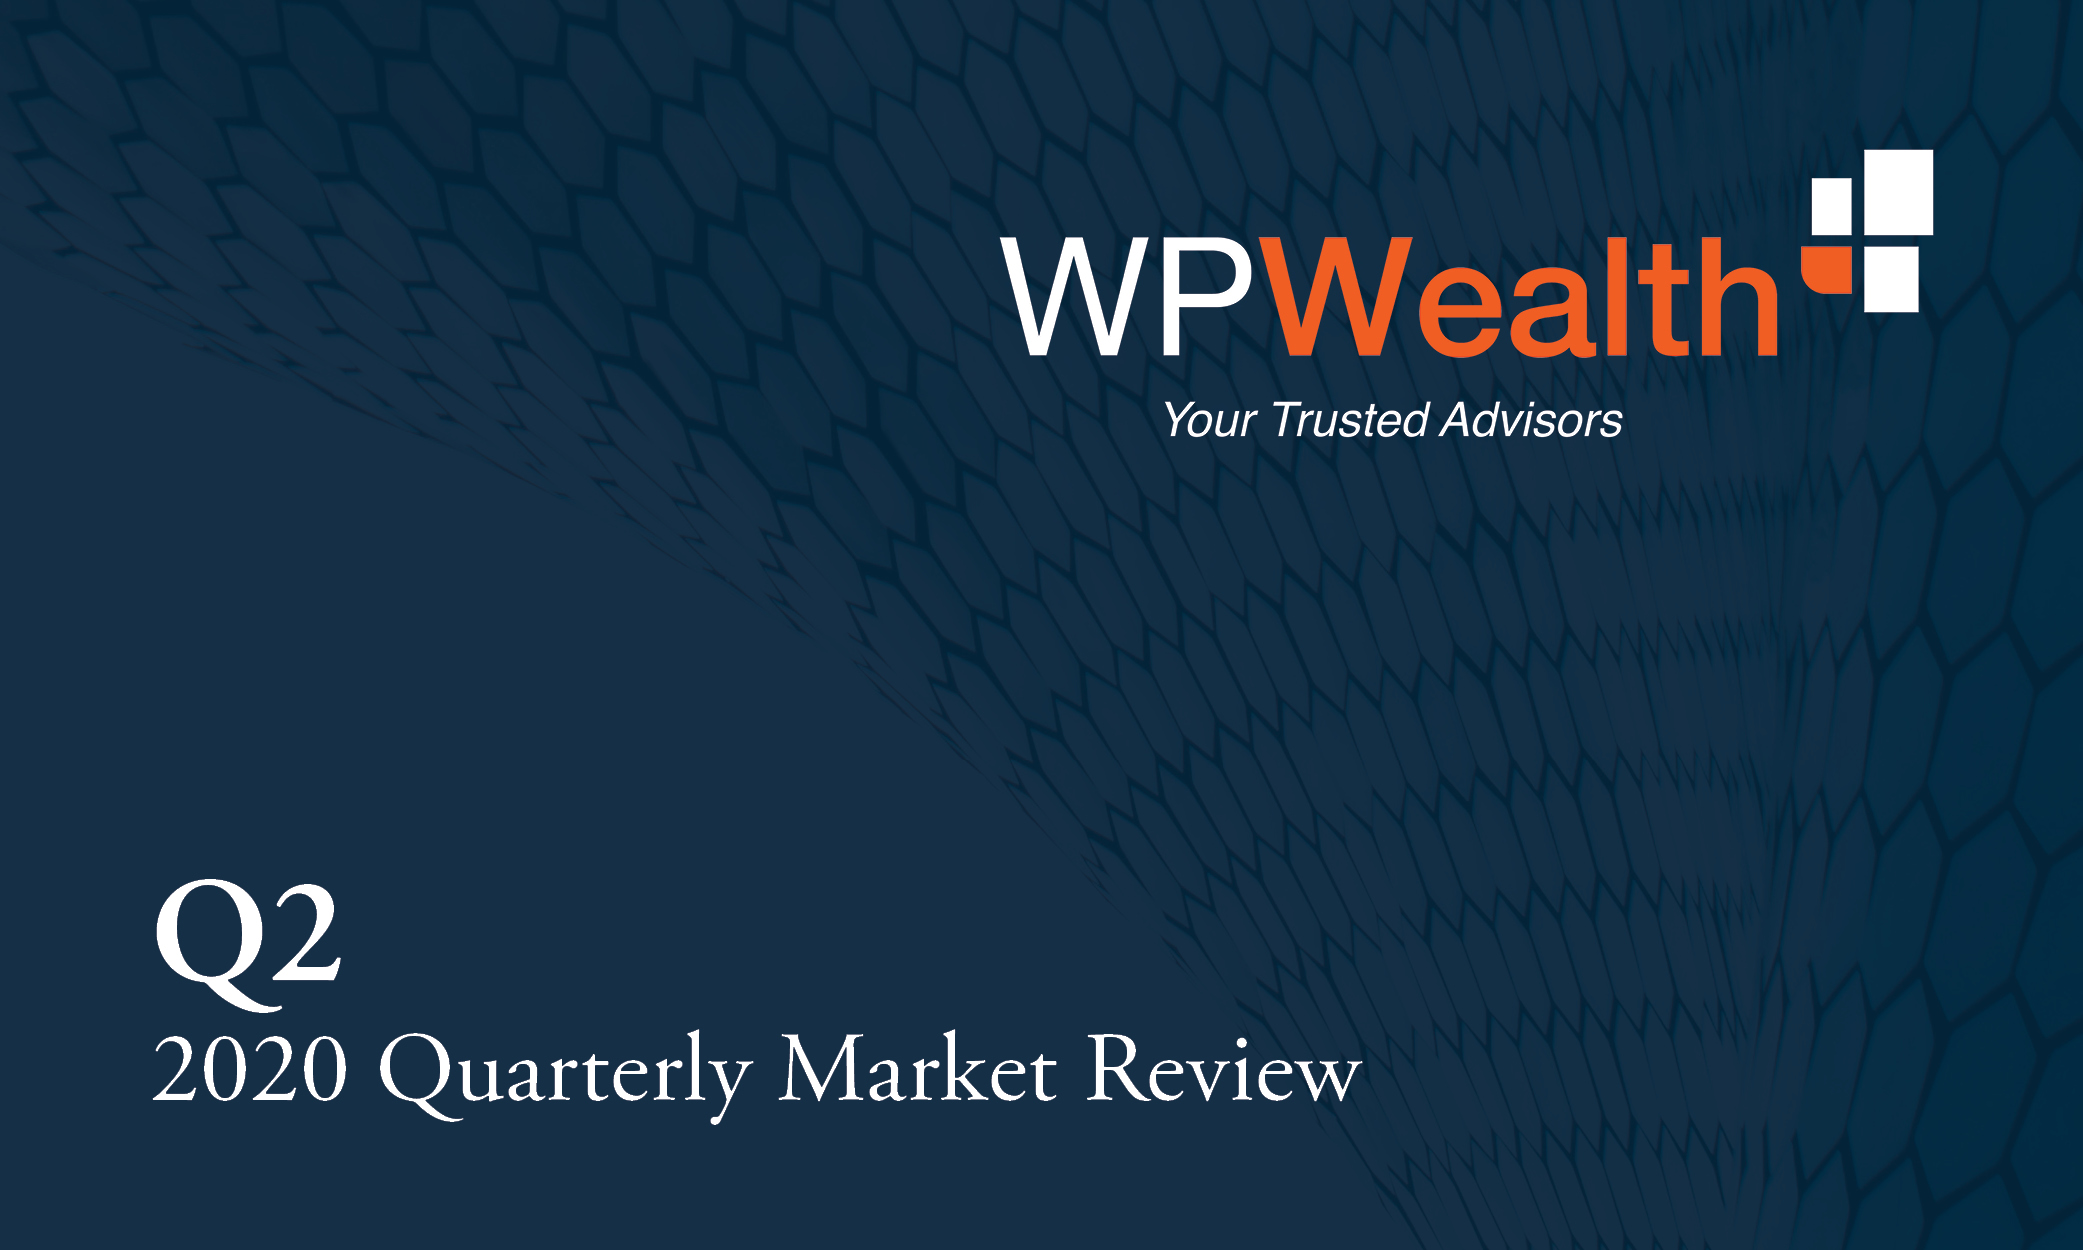 WPWealth Quarterly Market Review Q2 2020